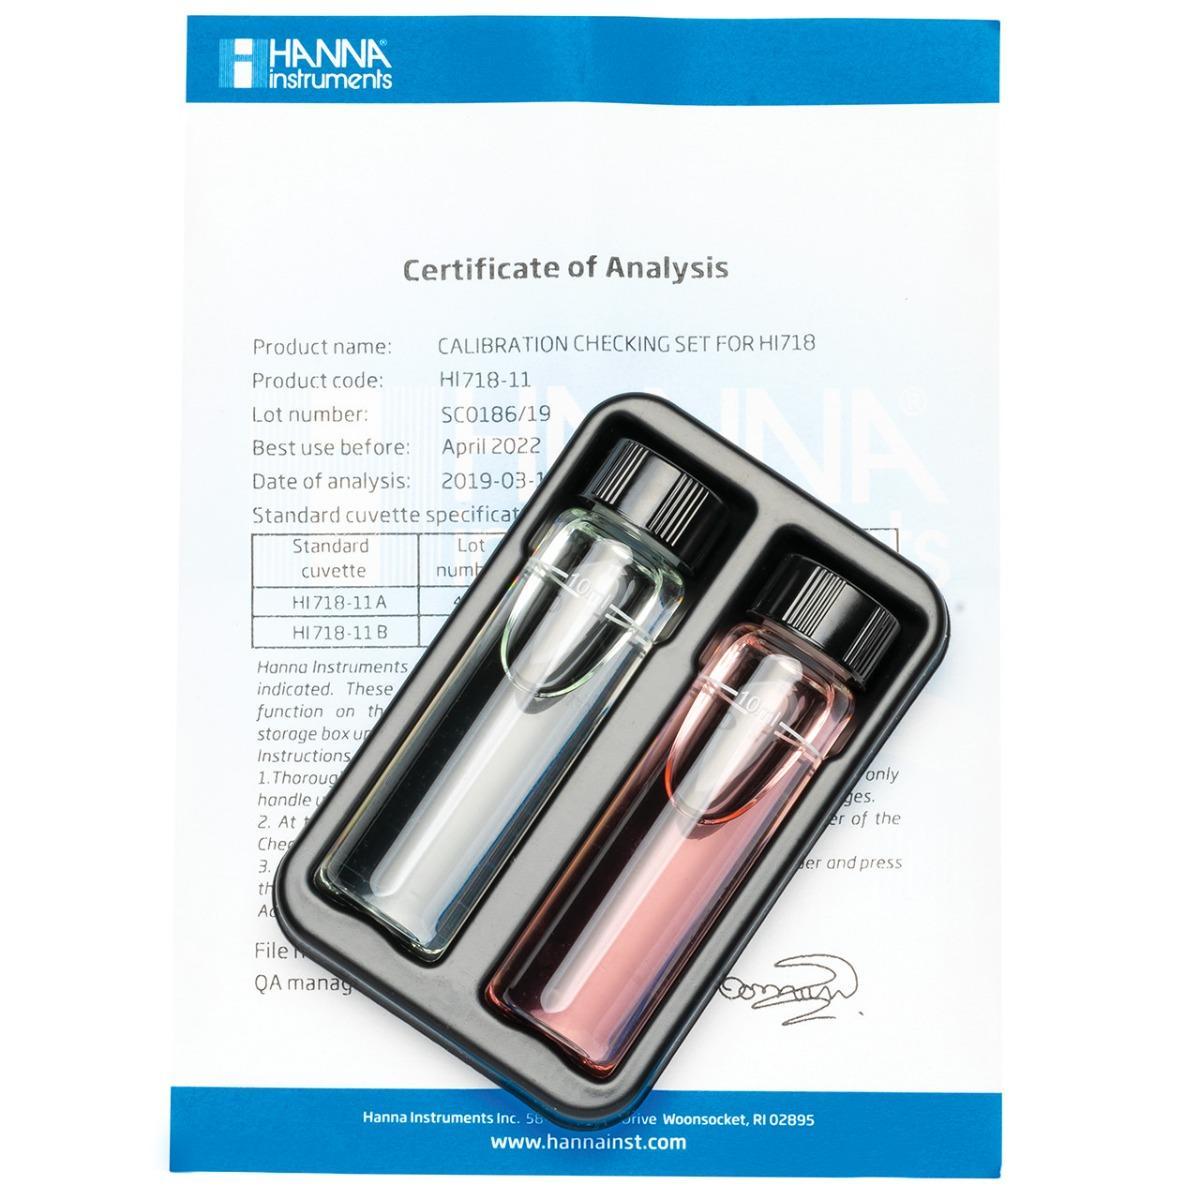 HI718-11 Iodine Checker® HC Calibration Set